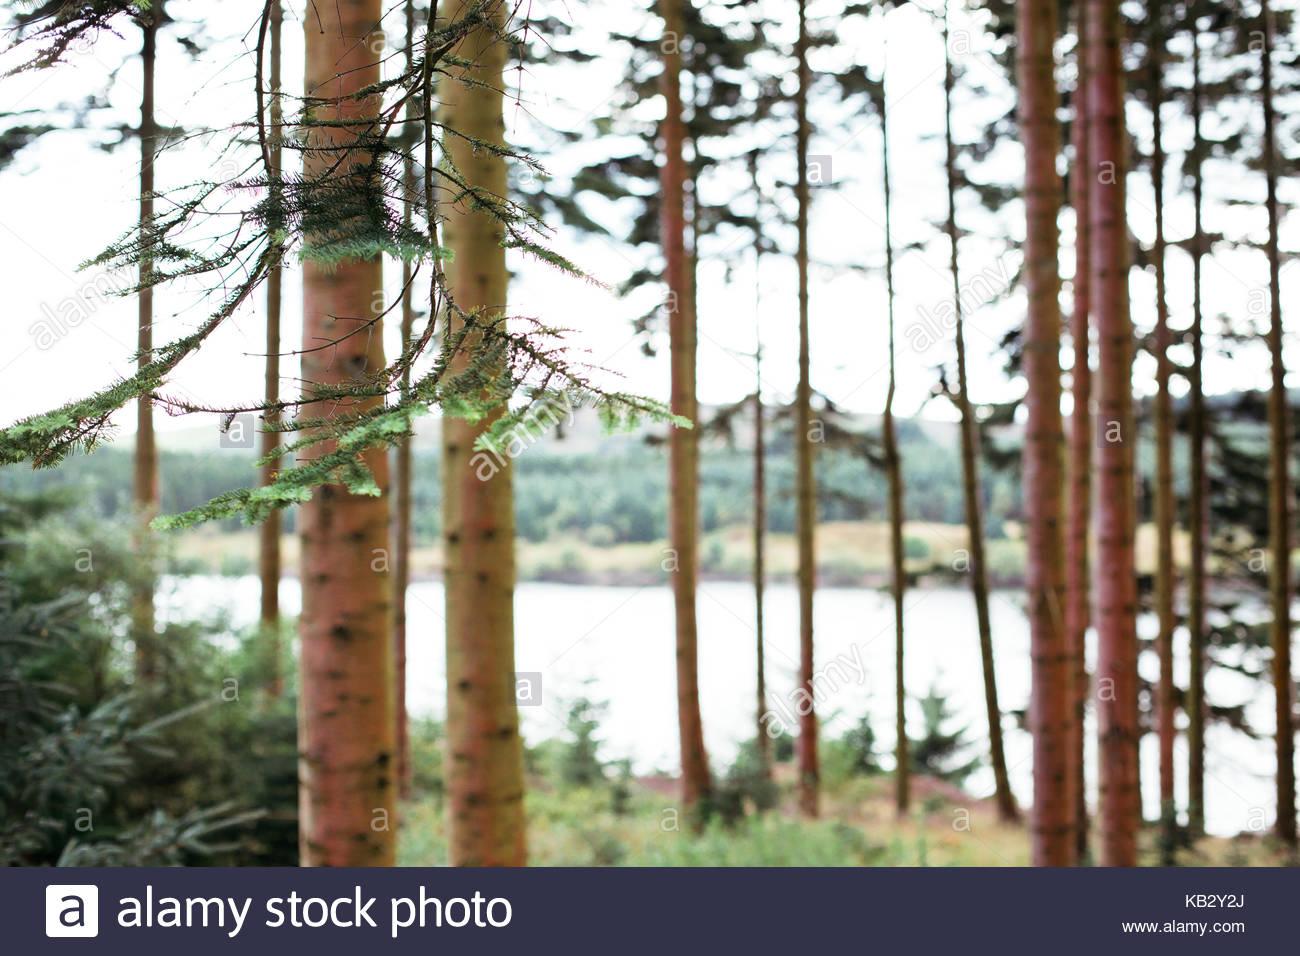 Fir trees - Stock Image